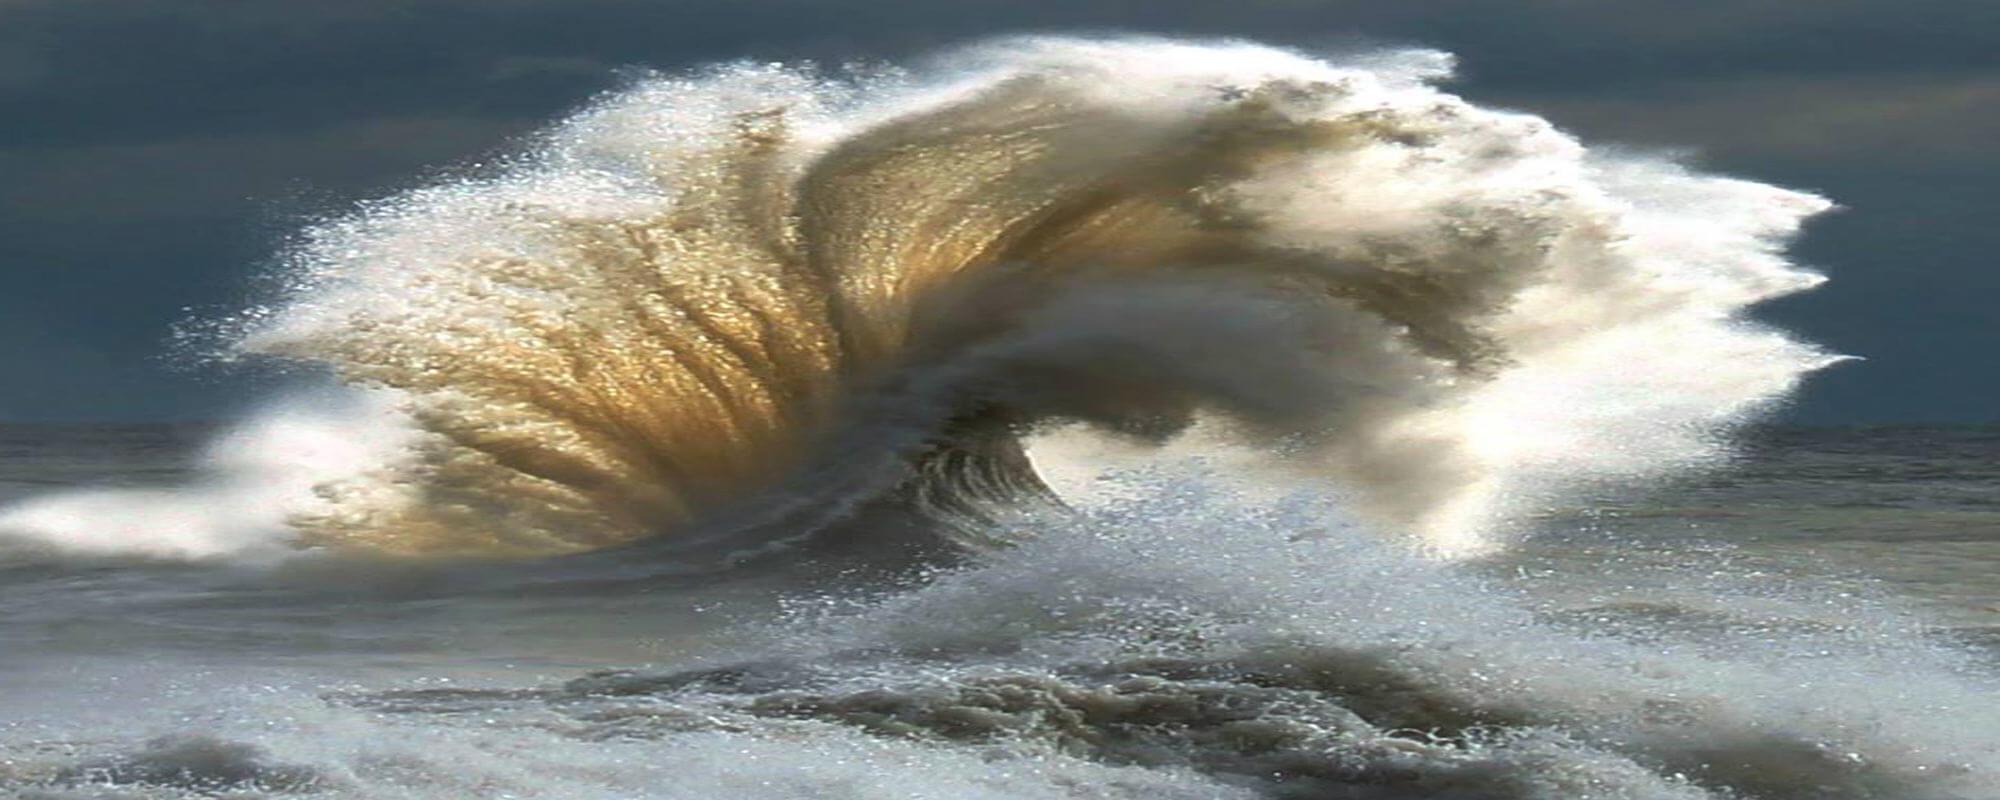 Exploring Wave Motion